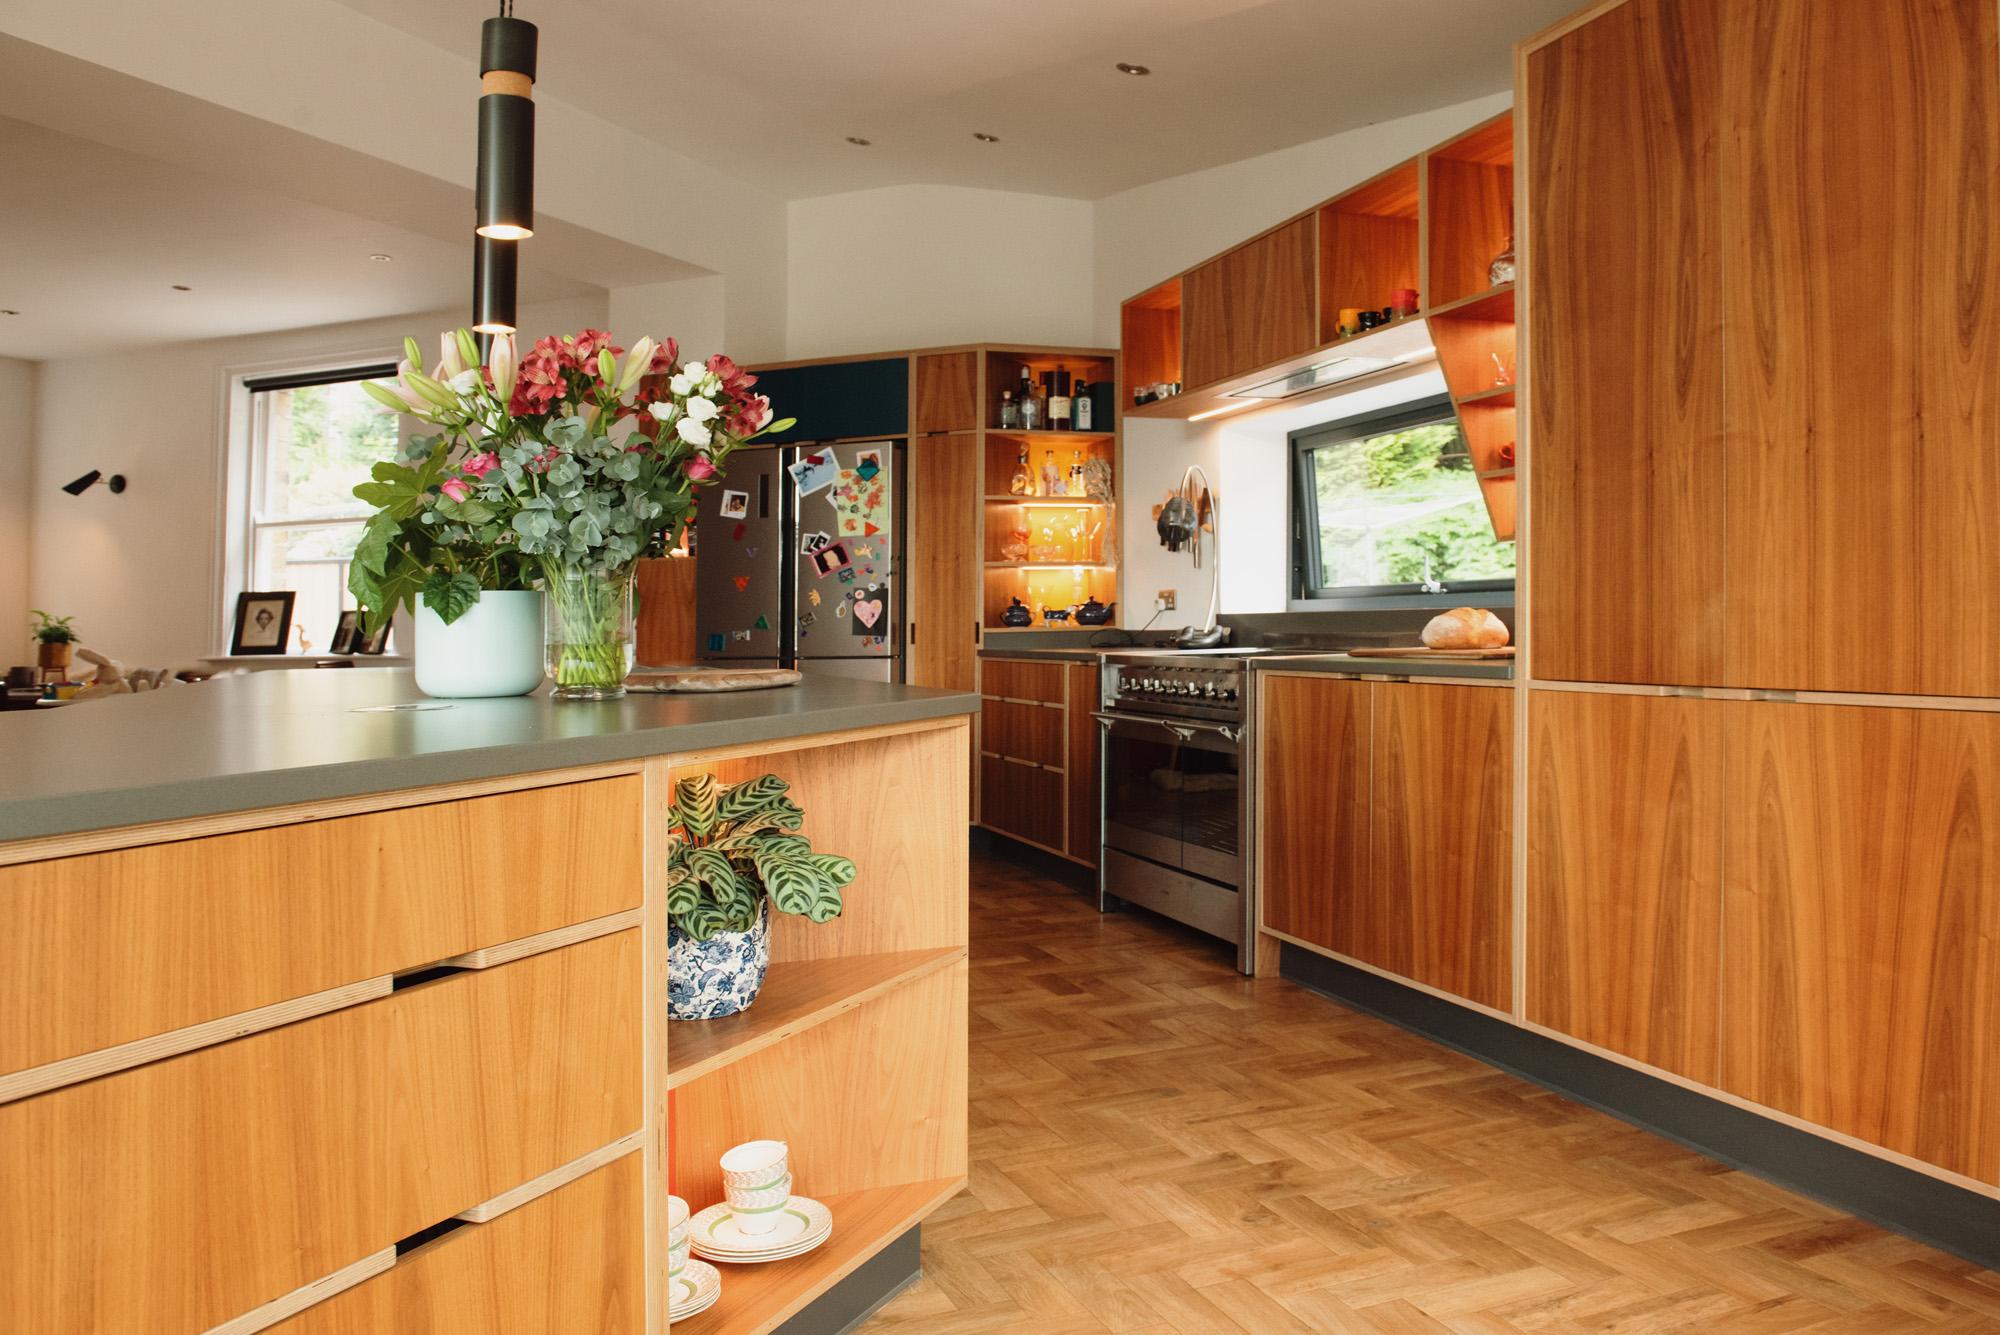 Bespoke plywood kitchen with walnut veneer